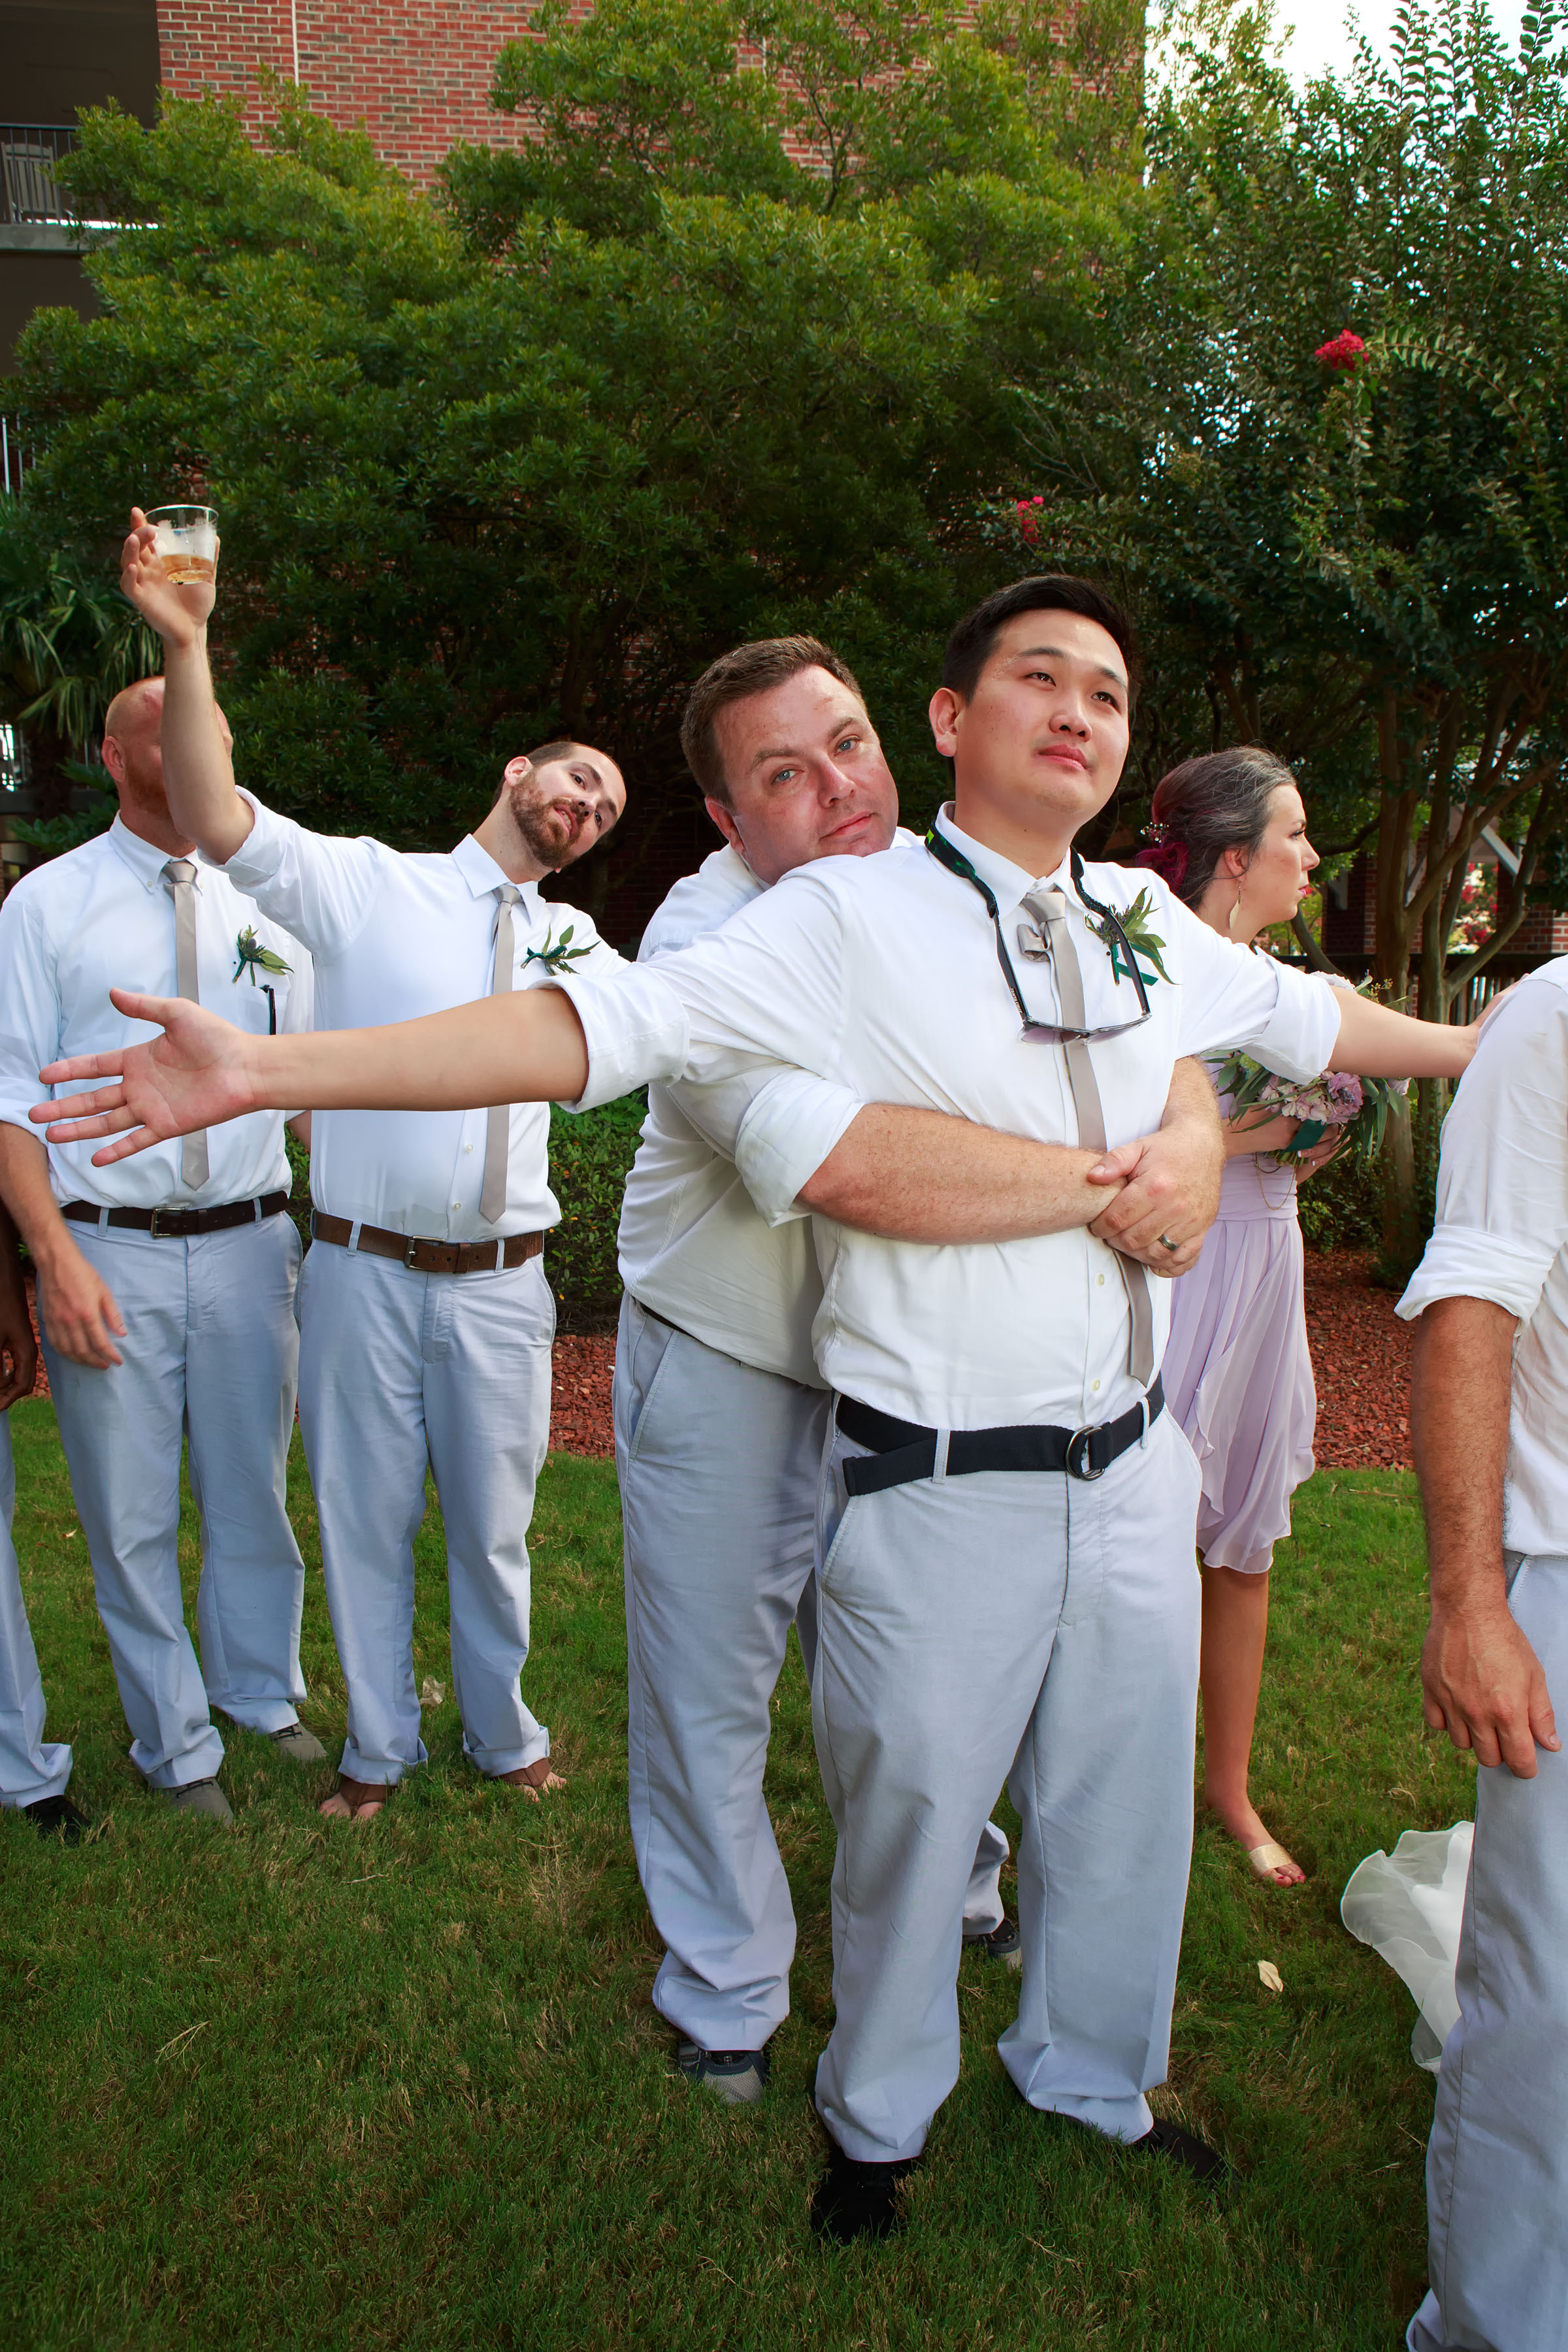 North_Carolina_Wedding_Photographer_Tiffany_Abruzzo_Group_28.jpg